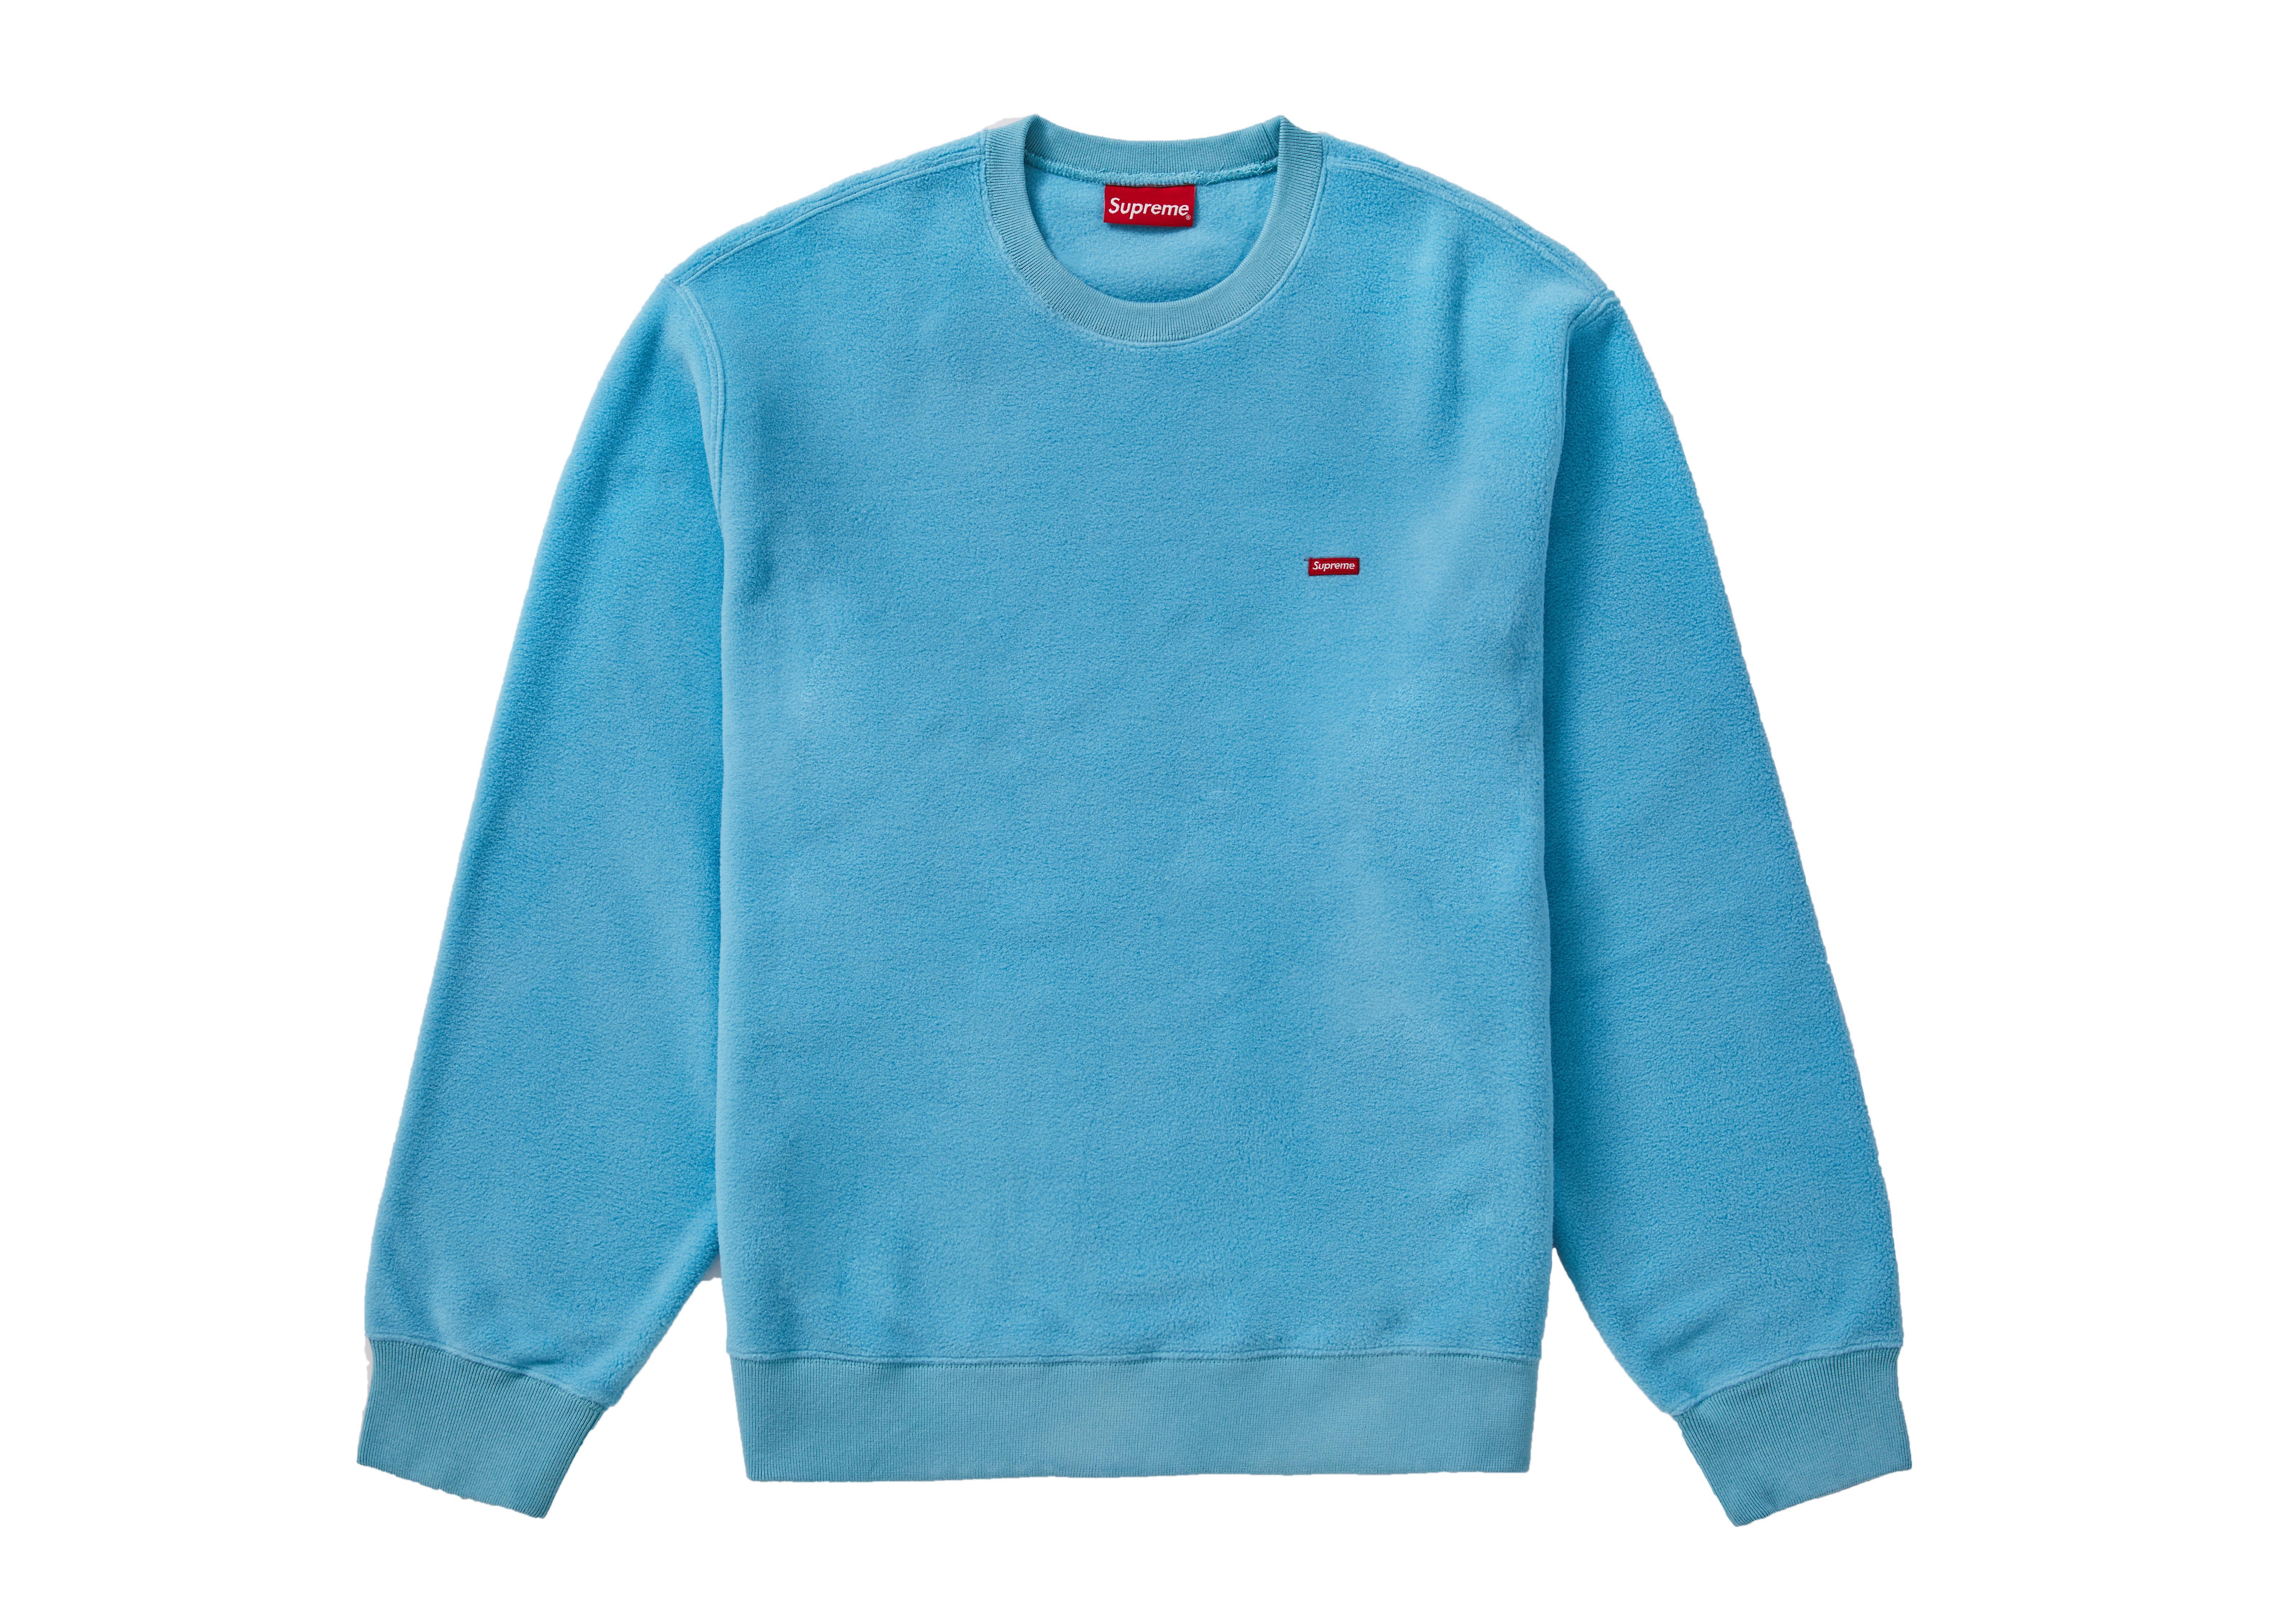 2d9037480292 Lyst - Supreme Polartec Small Box Crewneck Light Blue in Blue for Men